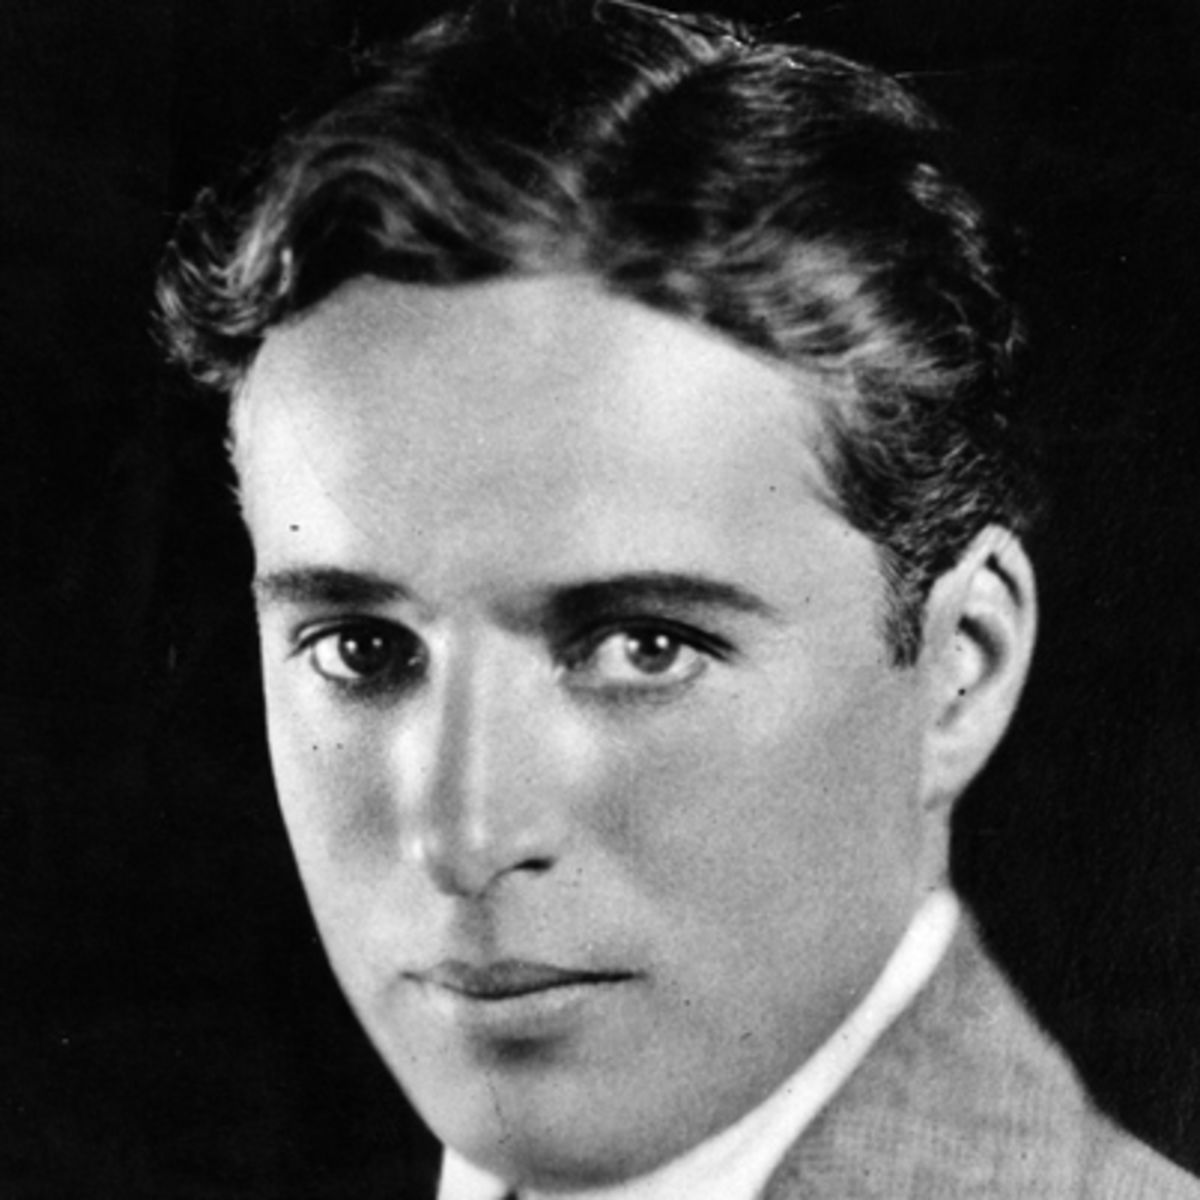 Charlie Chaplin Biography Comedian